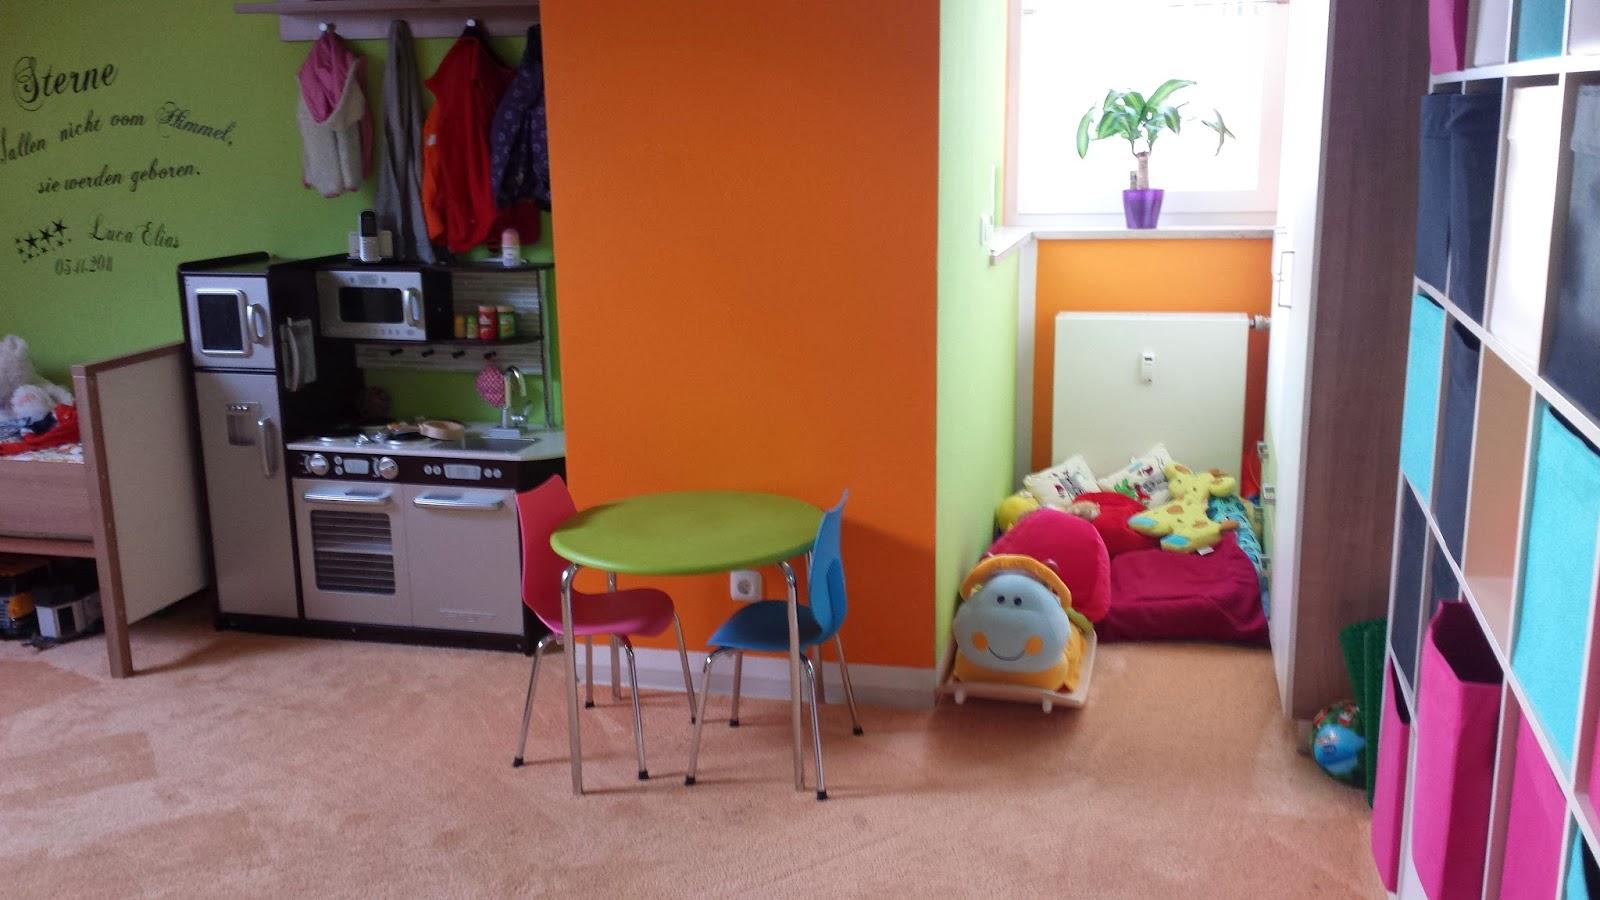 das leben ist kunterbunt montessori meets kinderzimmer. Black Bedroom Furniture Sets. Home Design Ideas